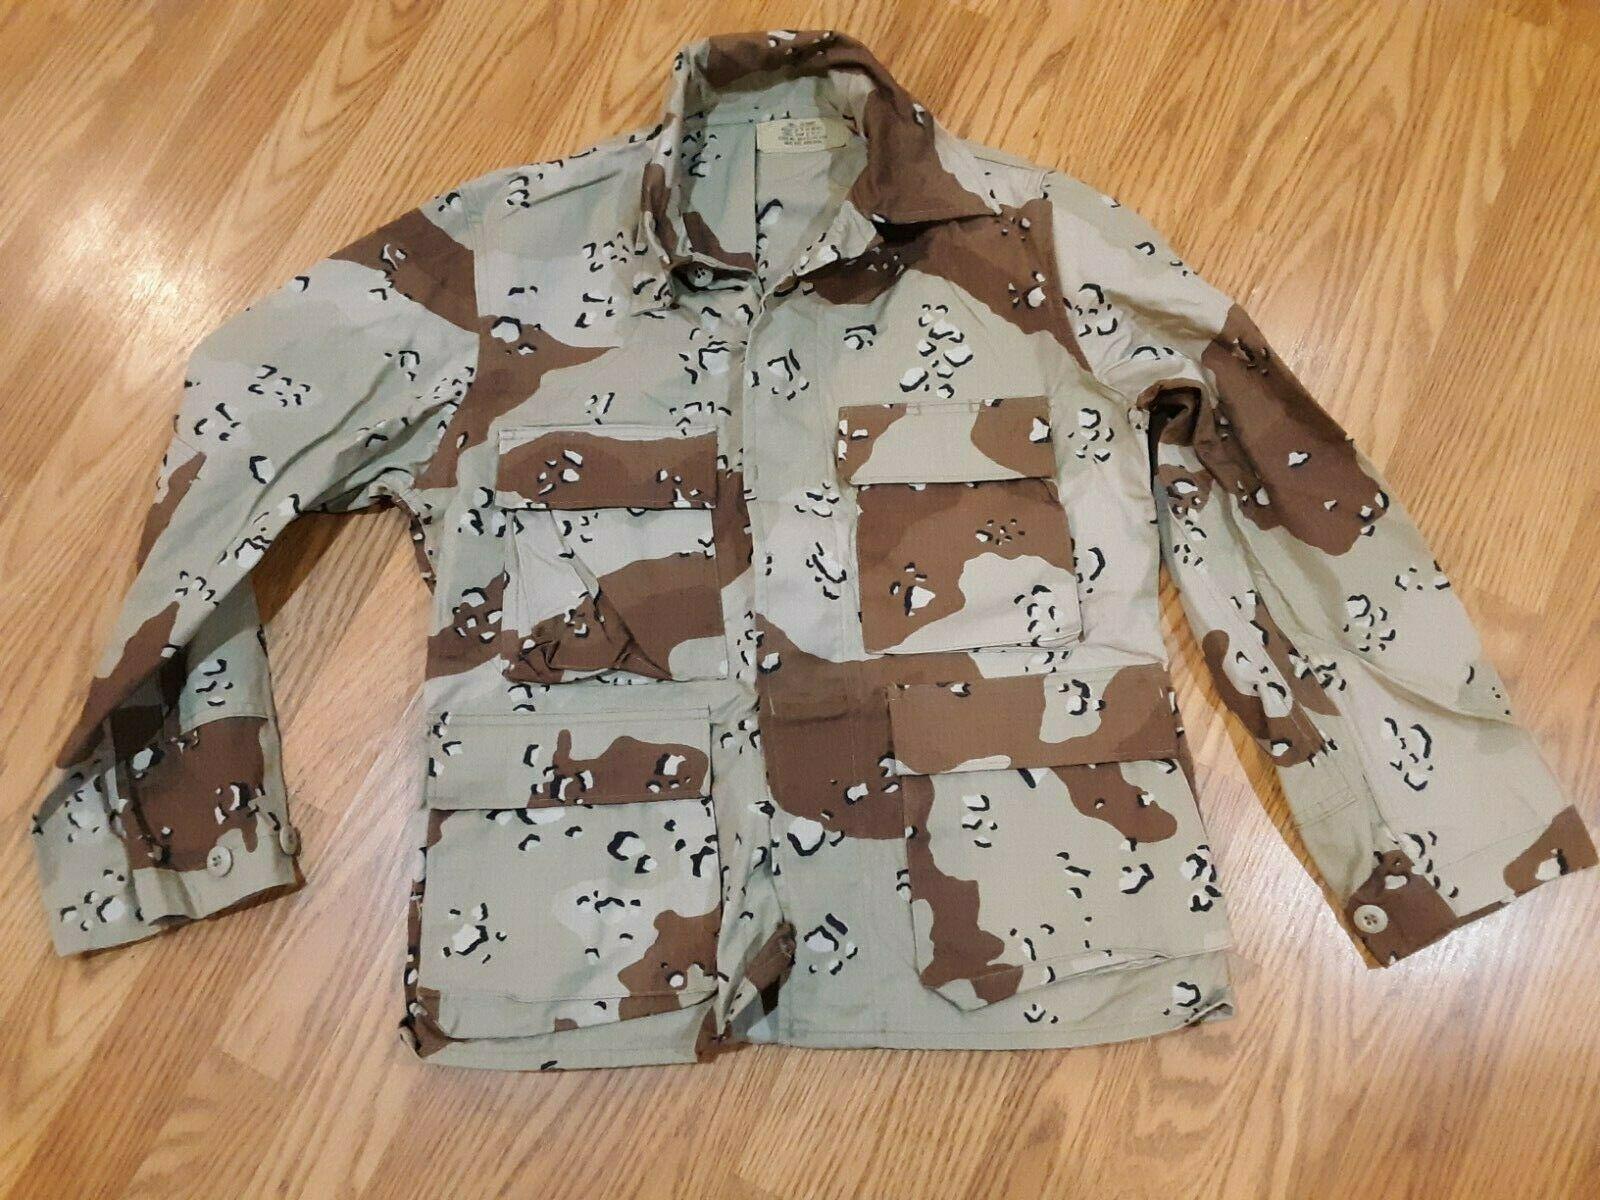 US Army Jacket Combat Coat 5 color Choc Chip Desert Camo small XX Short EUC - $32.62